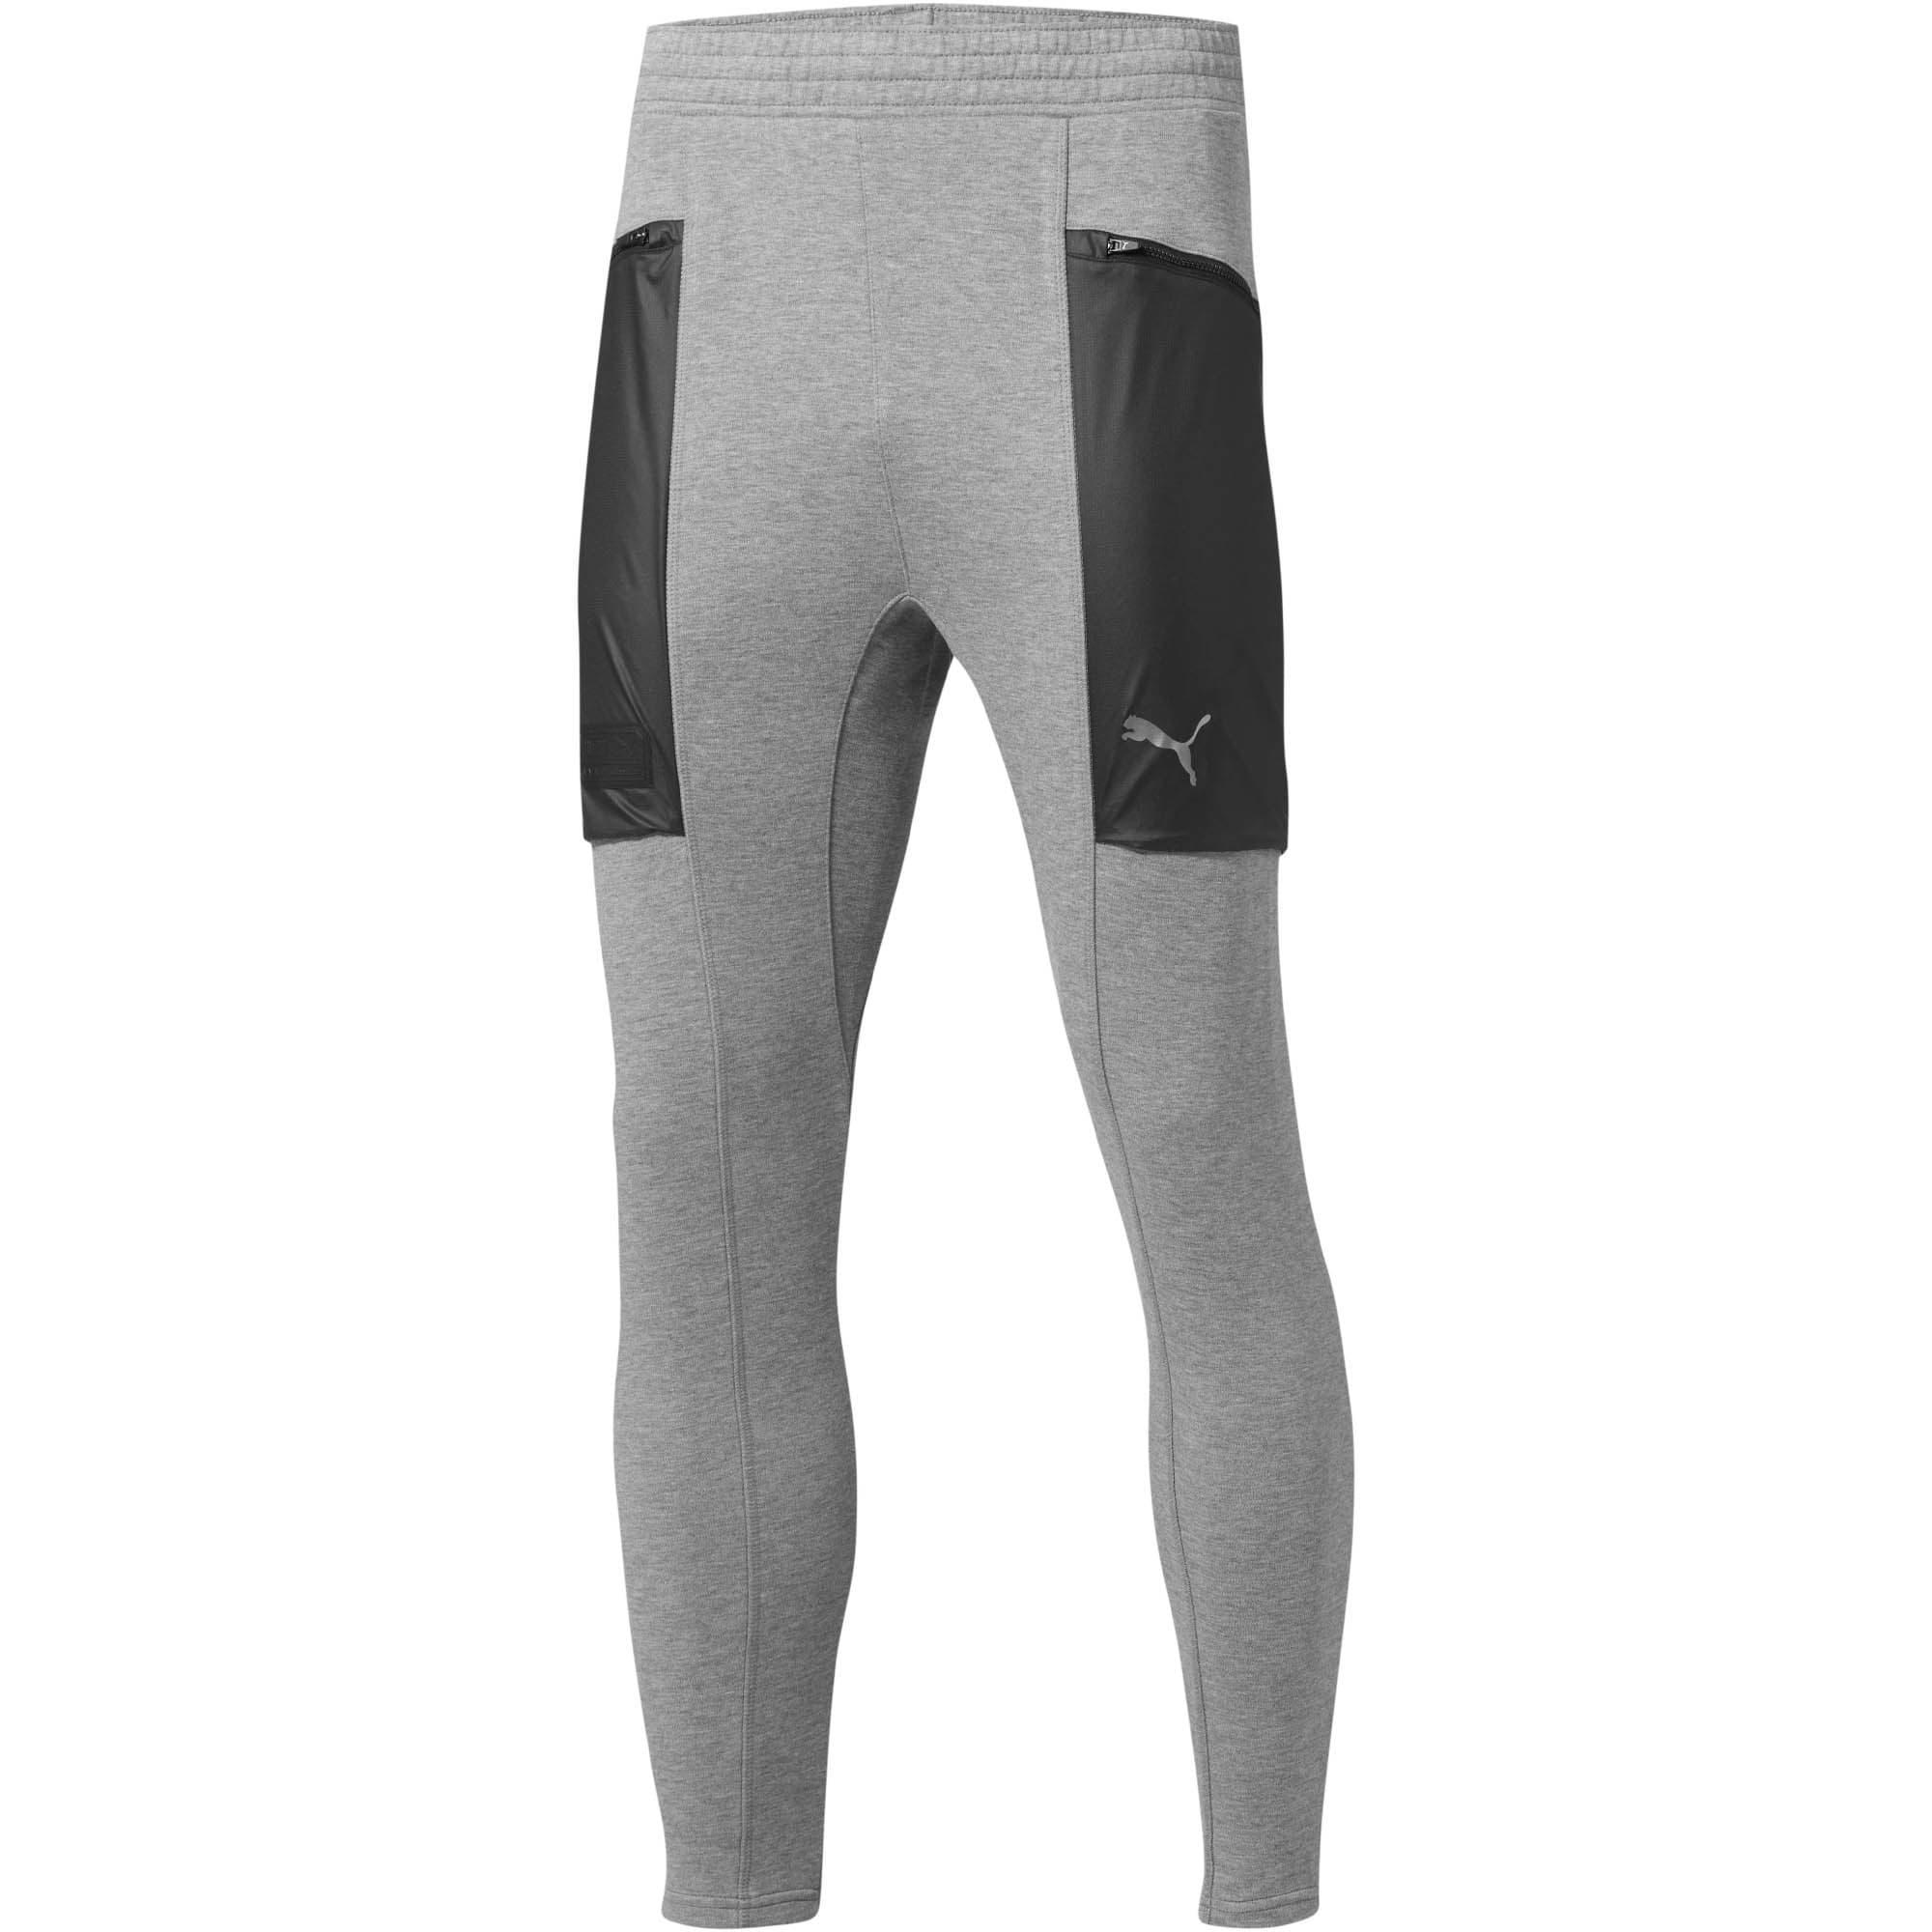 Thumbnail 1 of Energy Actum Men's Running Sweatpants, Medium Gray Heather, medium